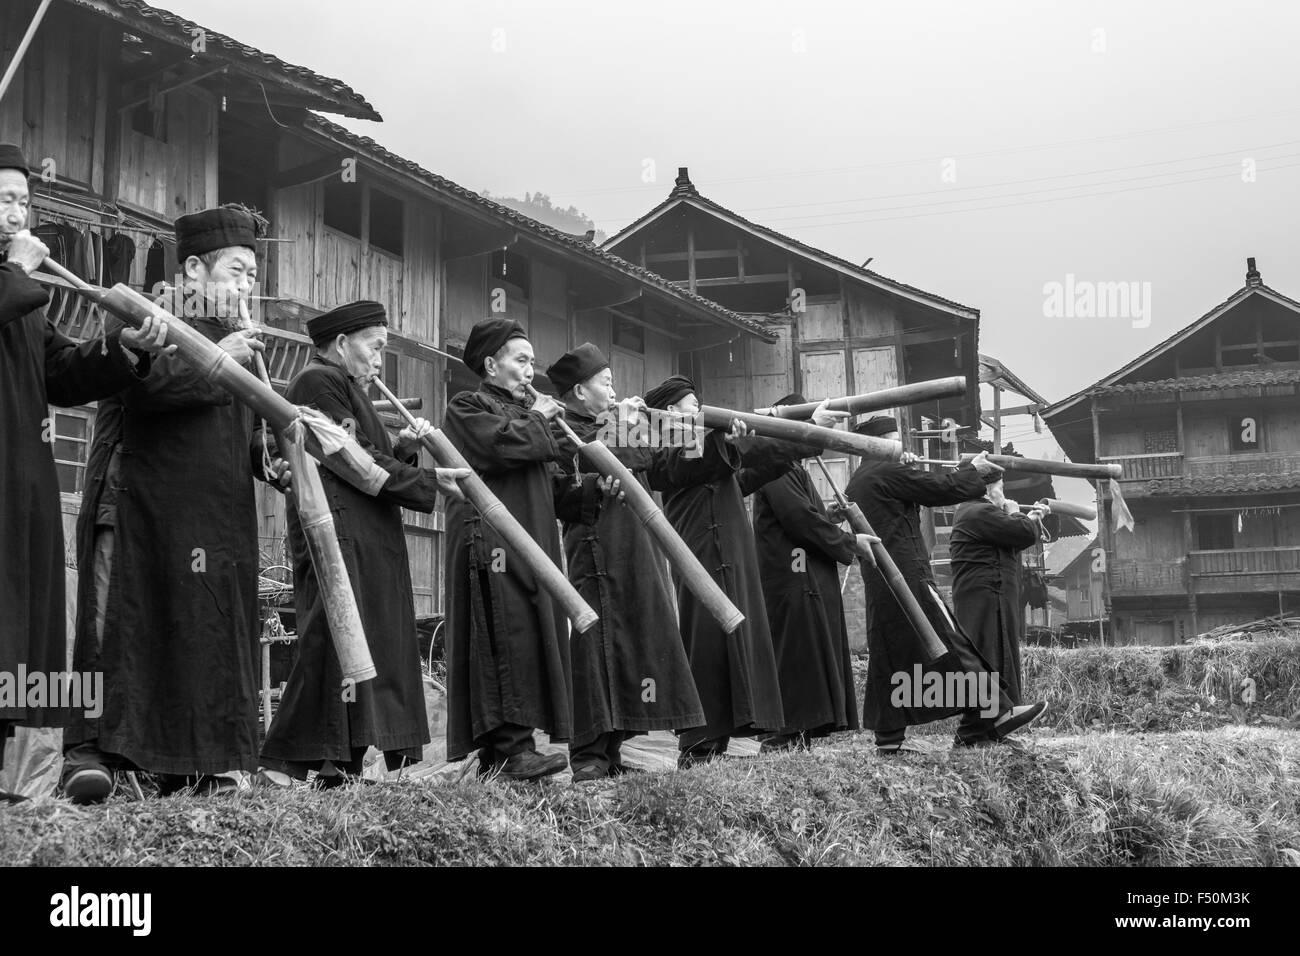 Lusheng ensemble BW, Long Skirt Miao Elders, Langde Shang Miao Village, Guizhou Province, China - Stock Image